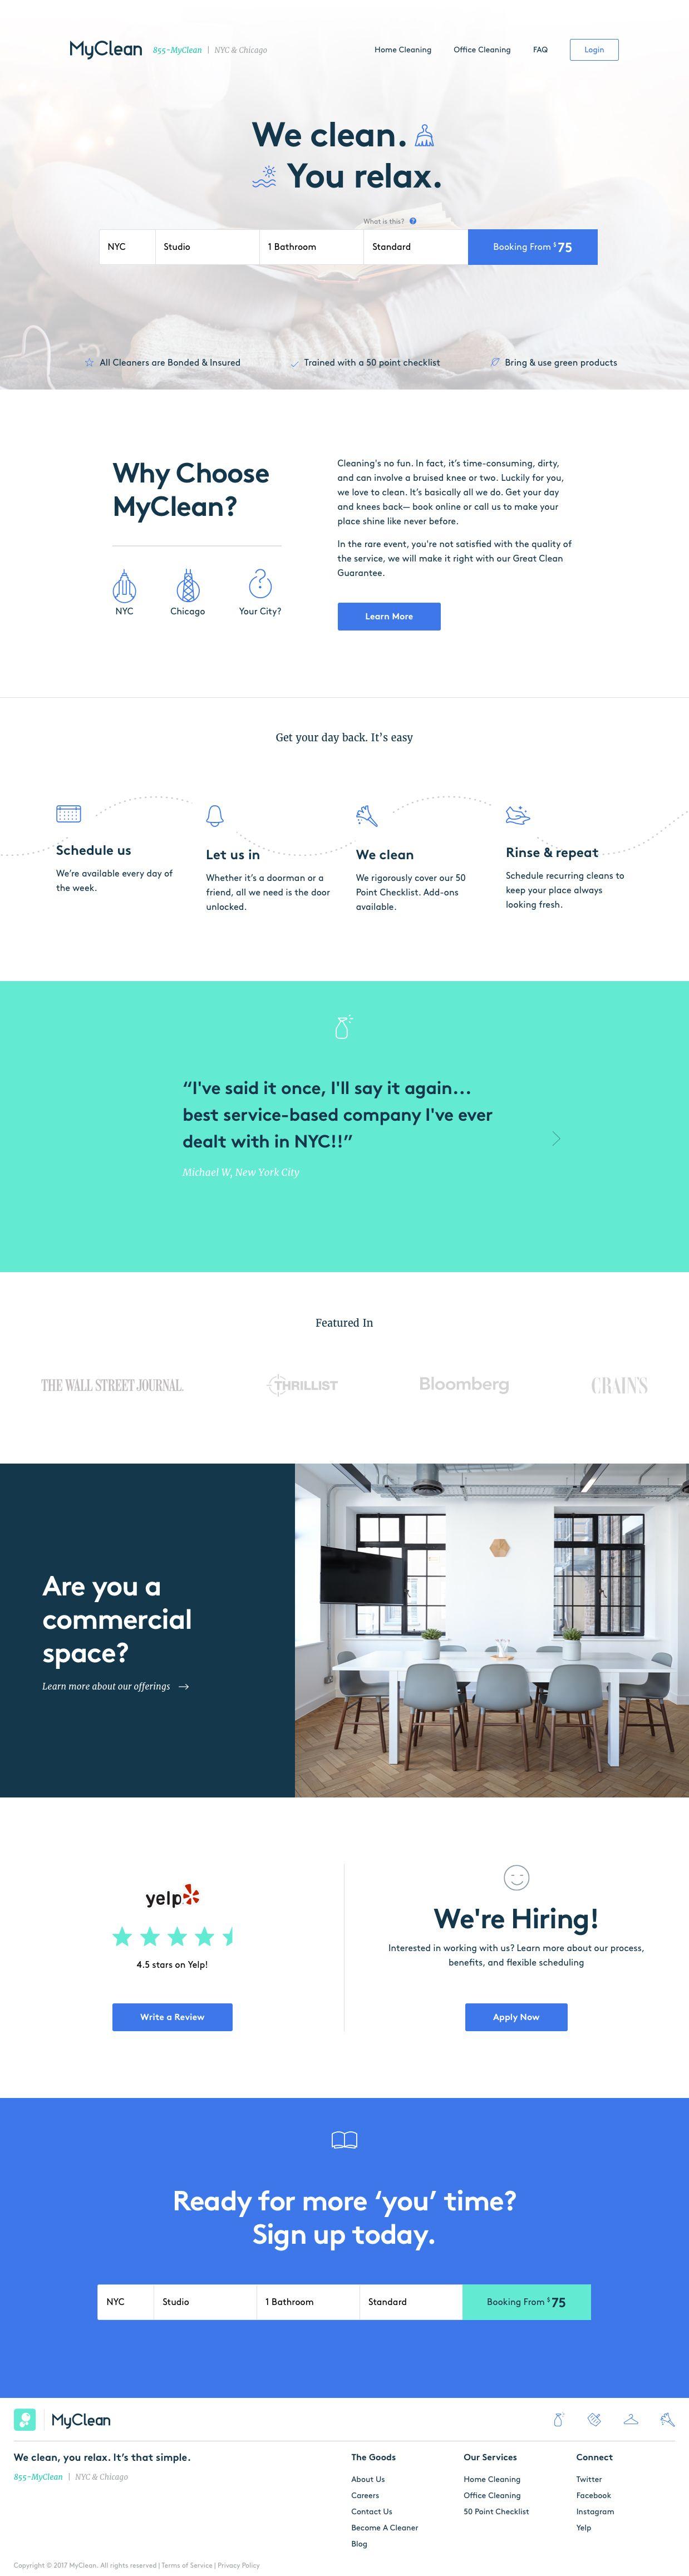 Myclean Landing Page Design Inspiration Design Web Design Projects Web Design Inspiration